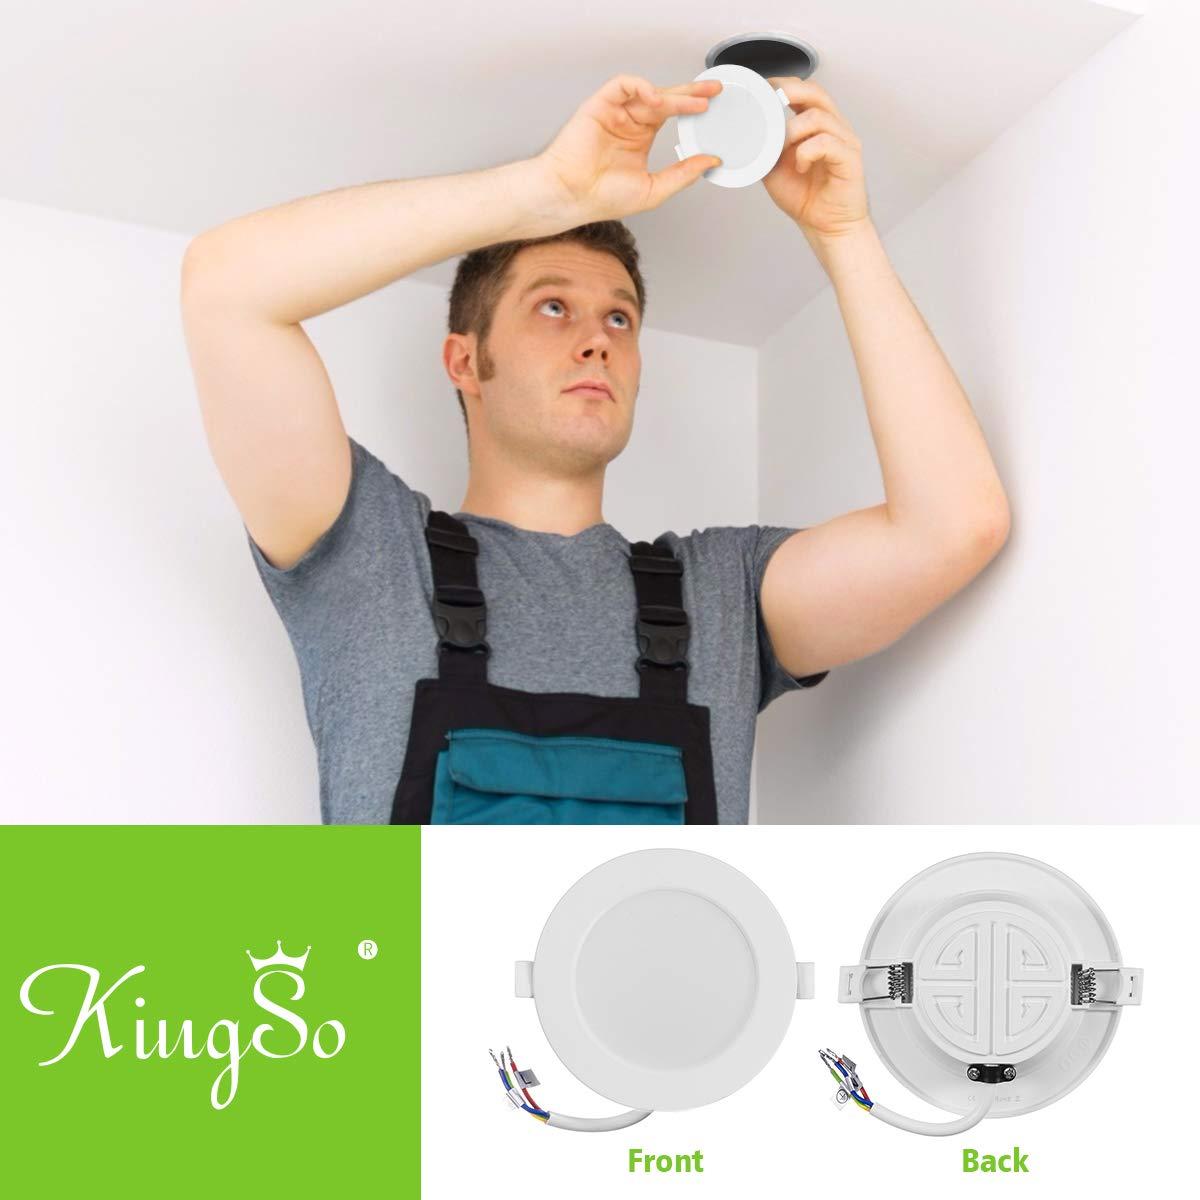 KINGSO 6 Pack LED Recessed Ceiling Spotlights Ultra-Thin IP44 7W 230V 90-120mm Warm White 3000K Beam Angle 120/° Spotlight Downlight Lighting for Bathroom Living Room Kitchen Energy Class A+